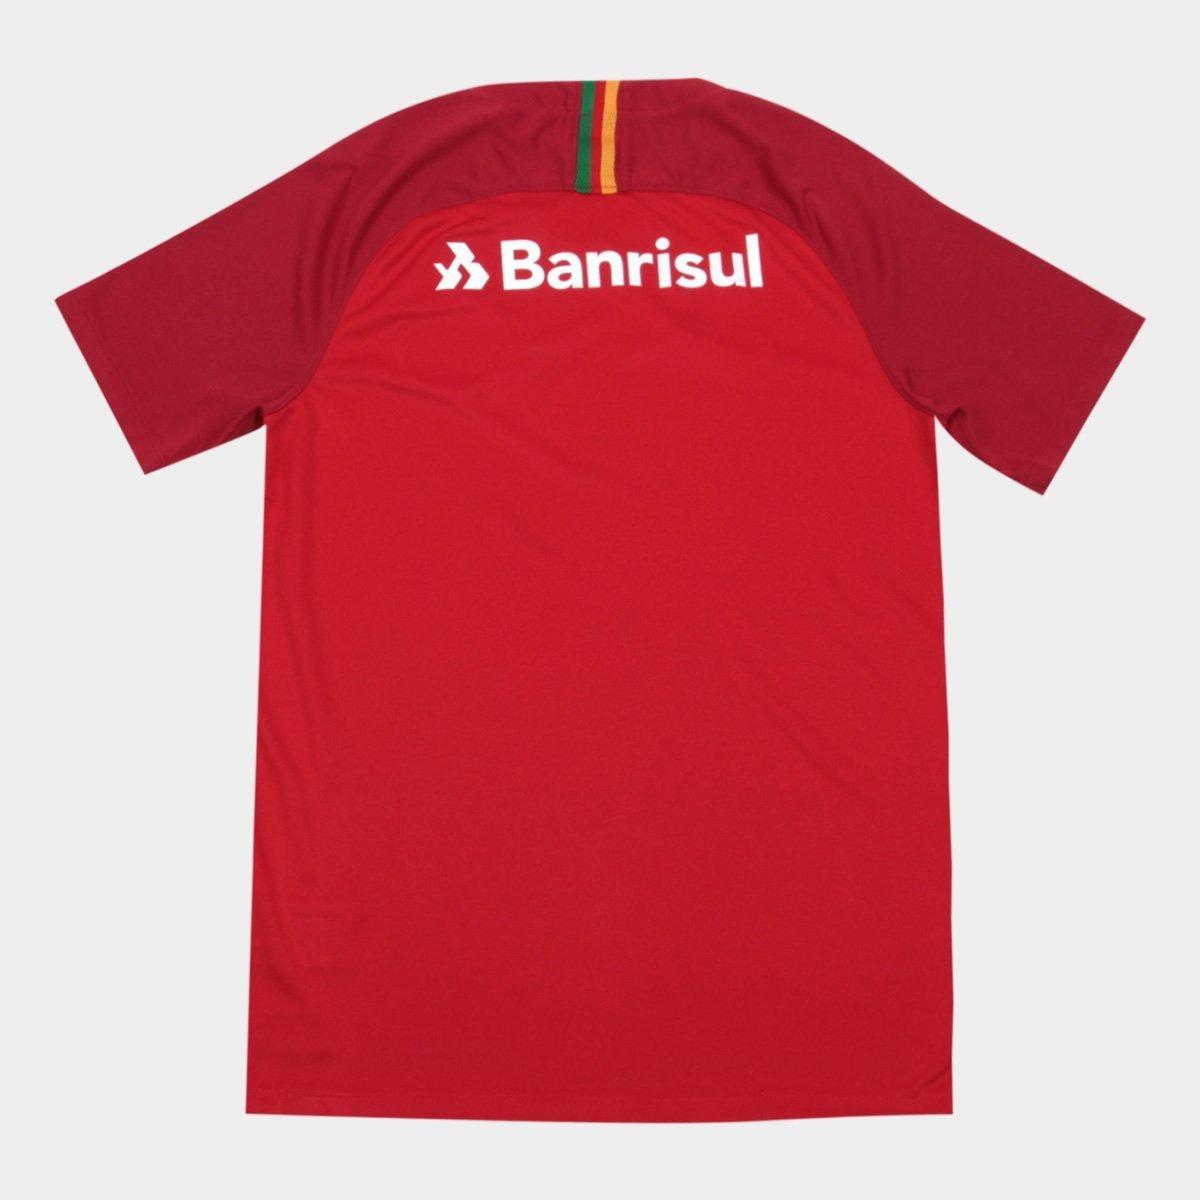 camisa internacional i 18 19 torcedor nike masculina. Carregando zoom... camisa  internacional masculina. Carregando zoom. b594a7e0691a0